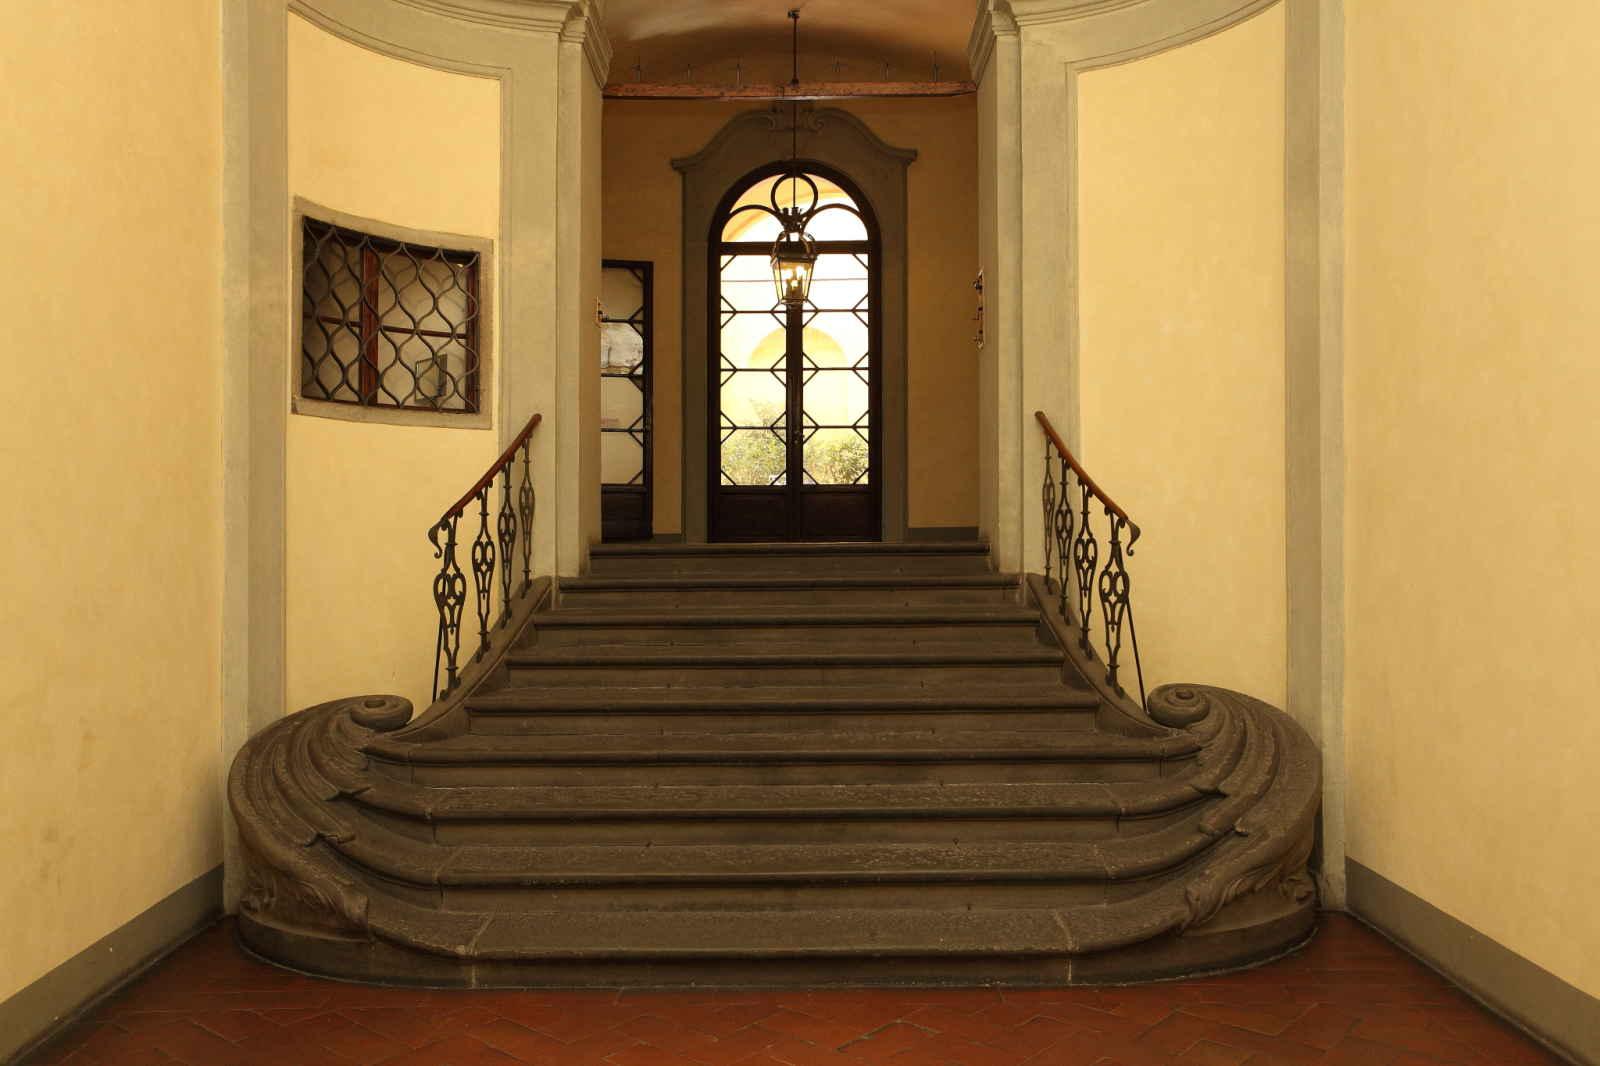 Séjour Toscane - Residenza Fiorentina - 3*